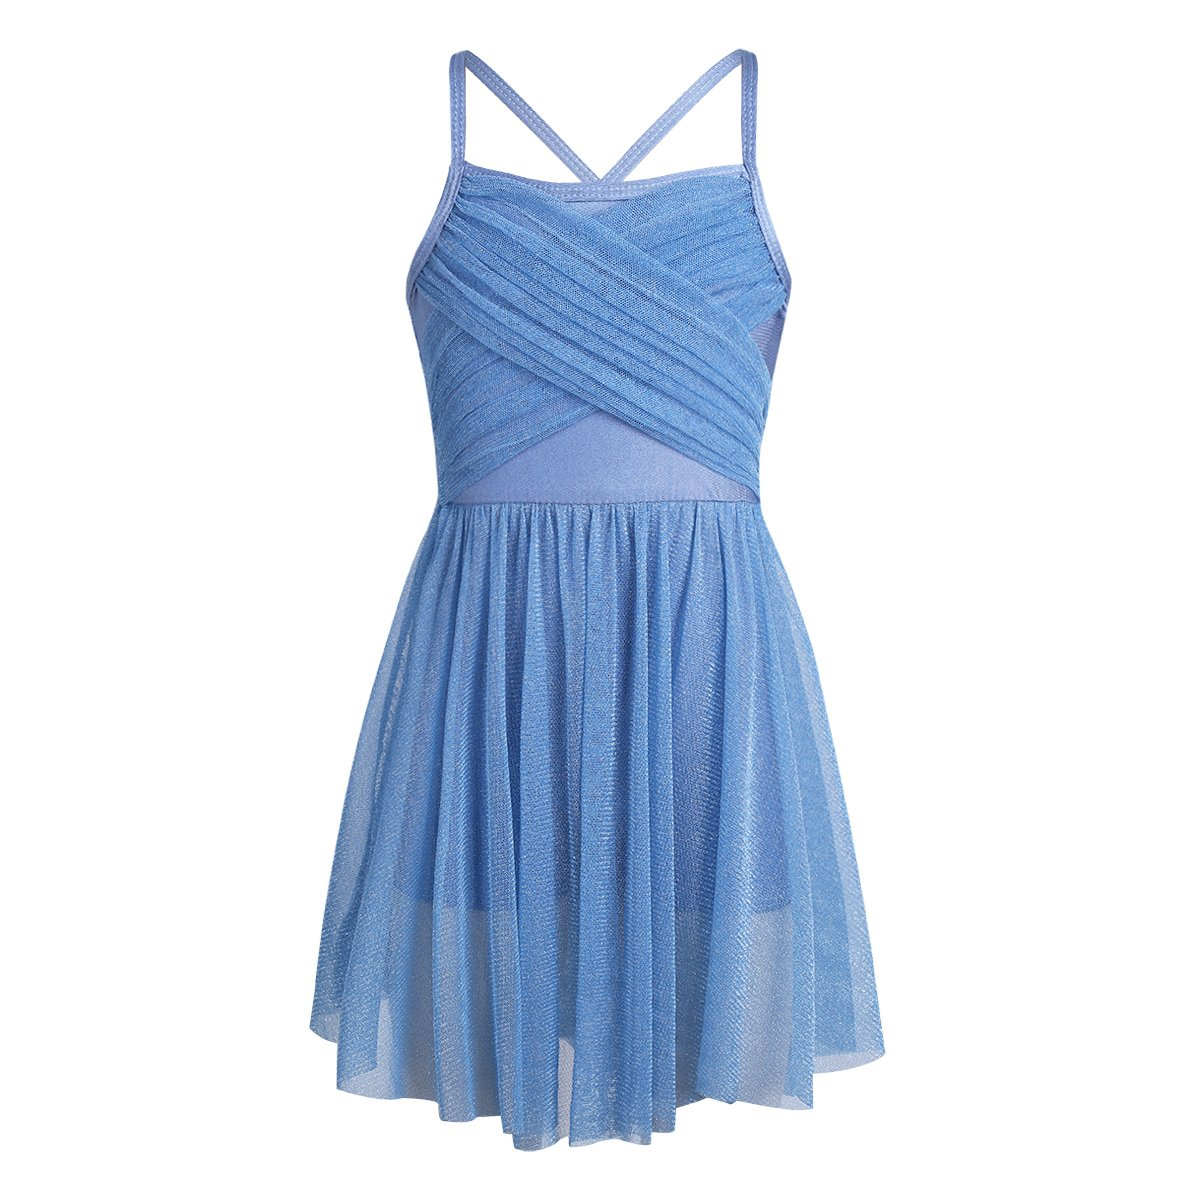 iiniim Girls Gymnasitc Ballet Dance Leotard Dress Skirt Ballerina Outfit Lyrical Dancewear Costume